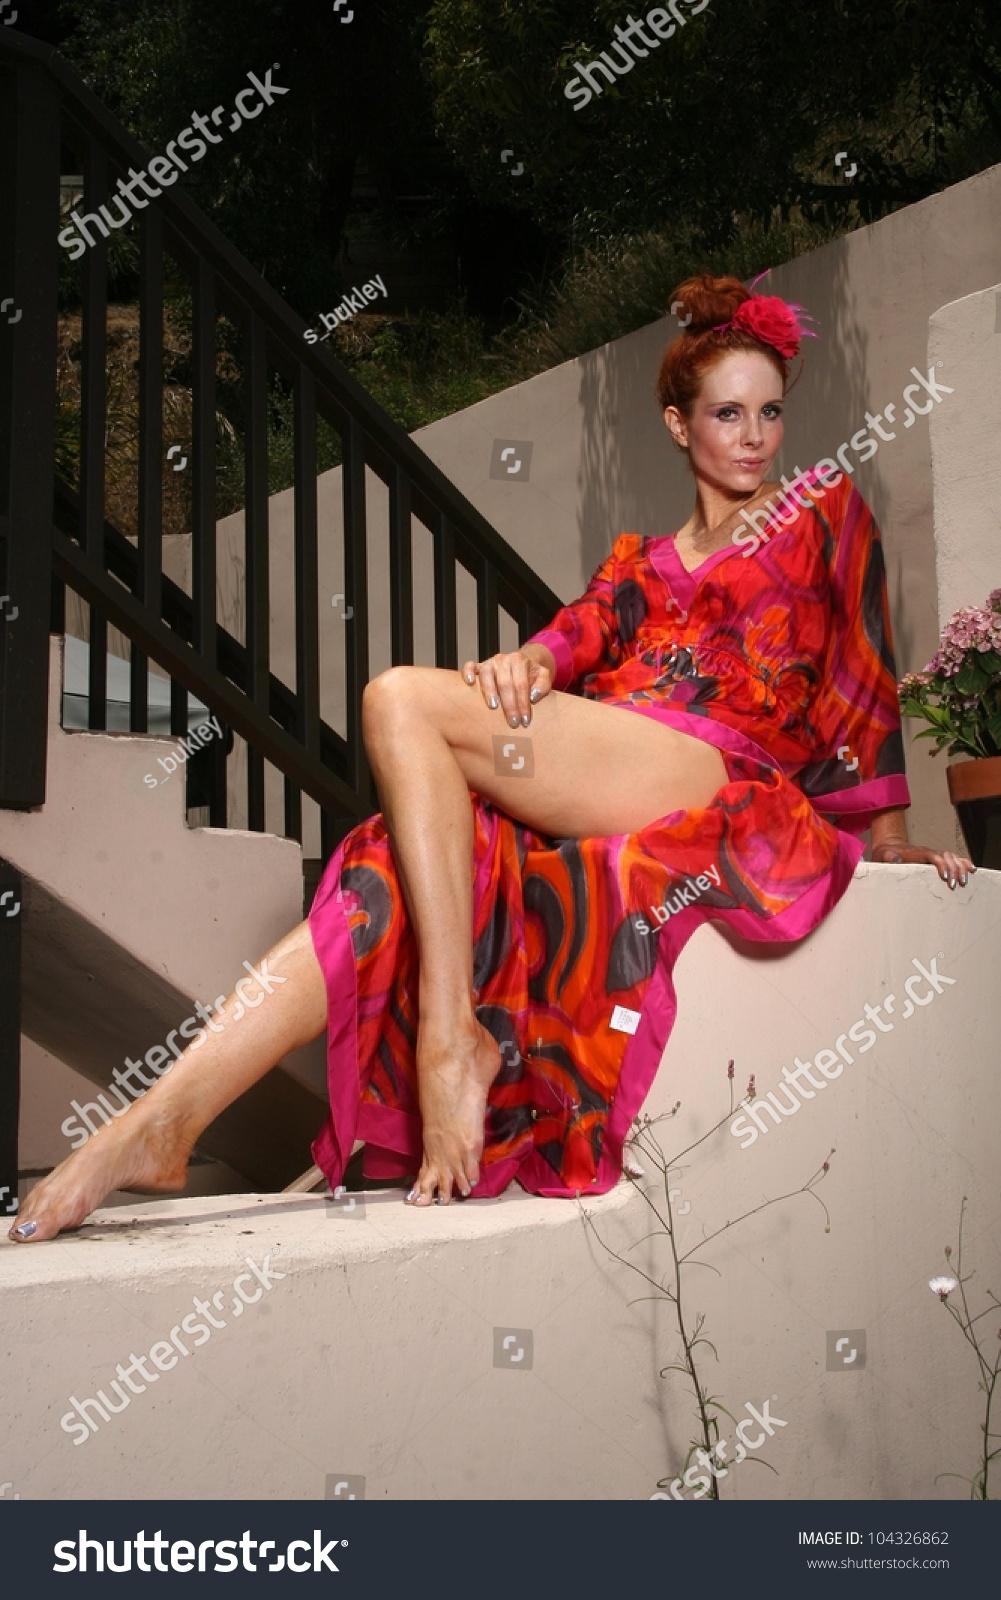 Celebrity Amanda Cerny nude (89 photos), Sexy, Hot, Feet, swimsuit 2006